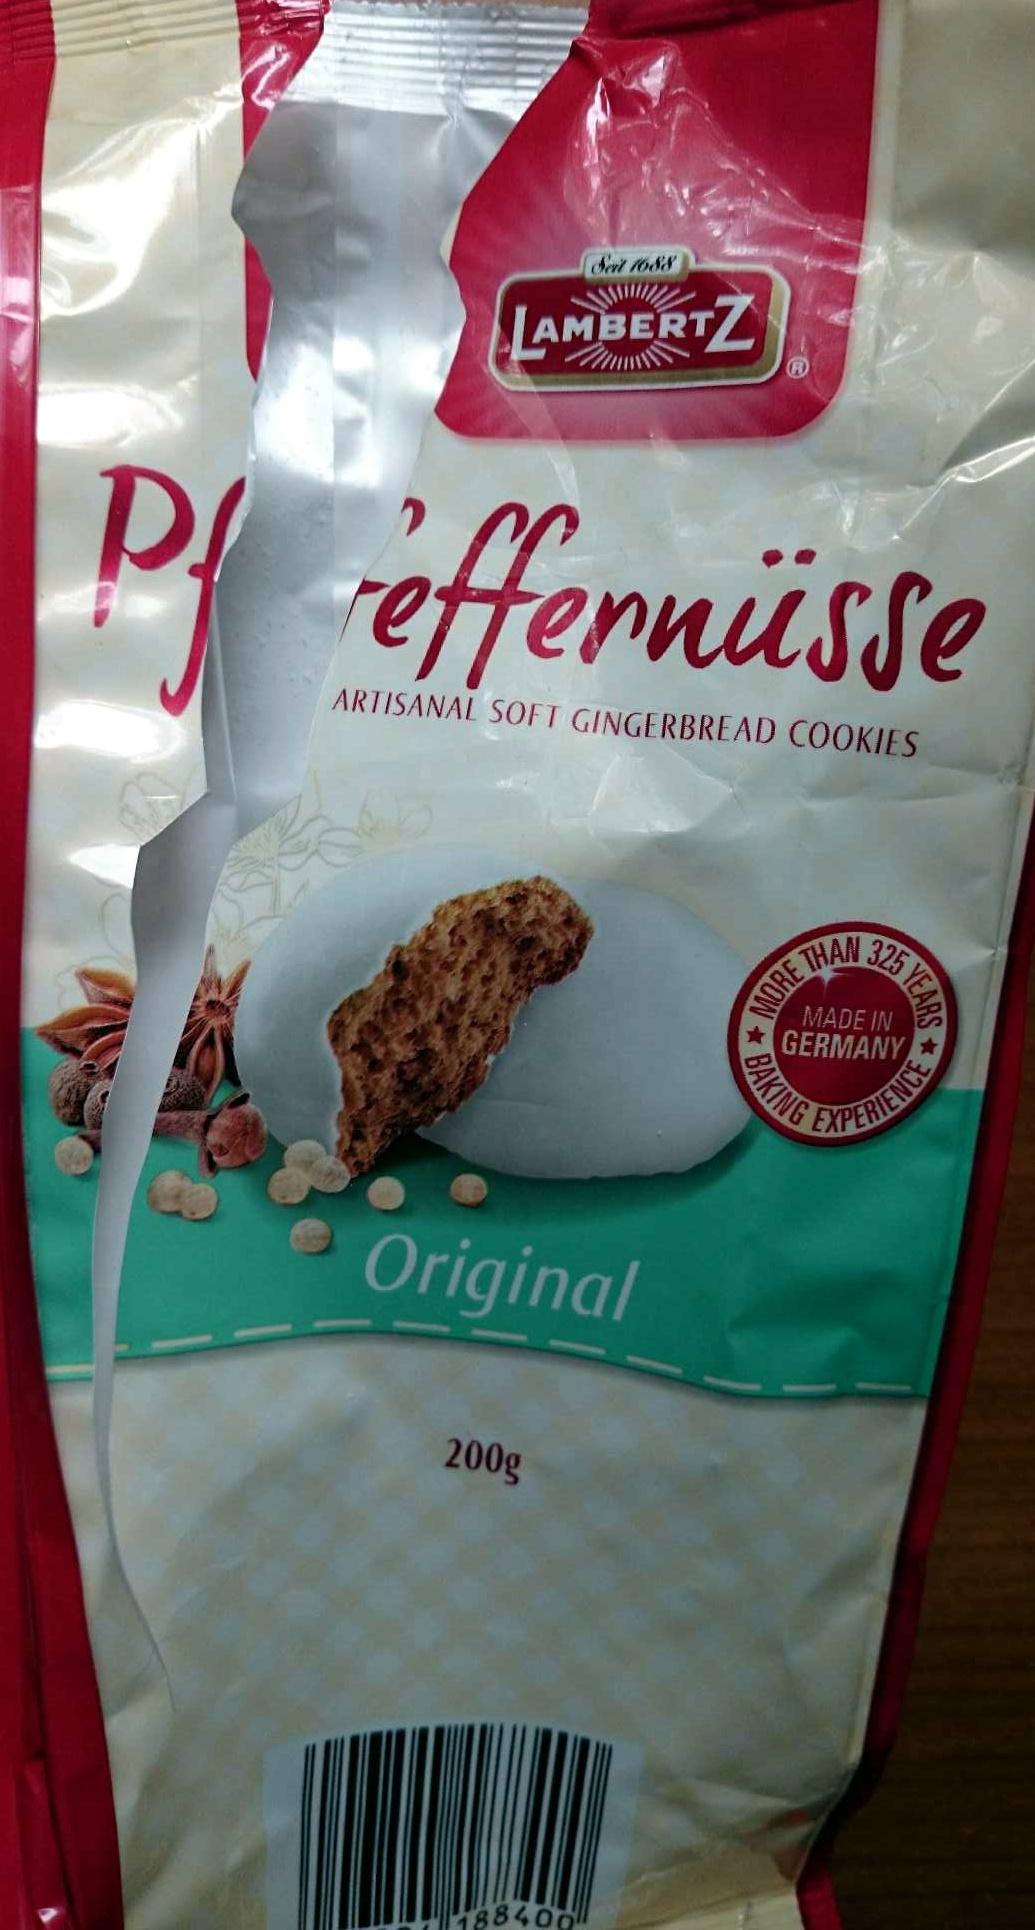 Pffefernusse Original - Product - en